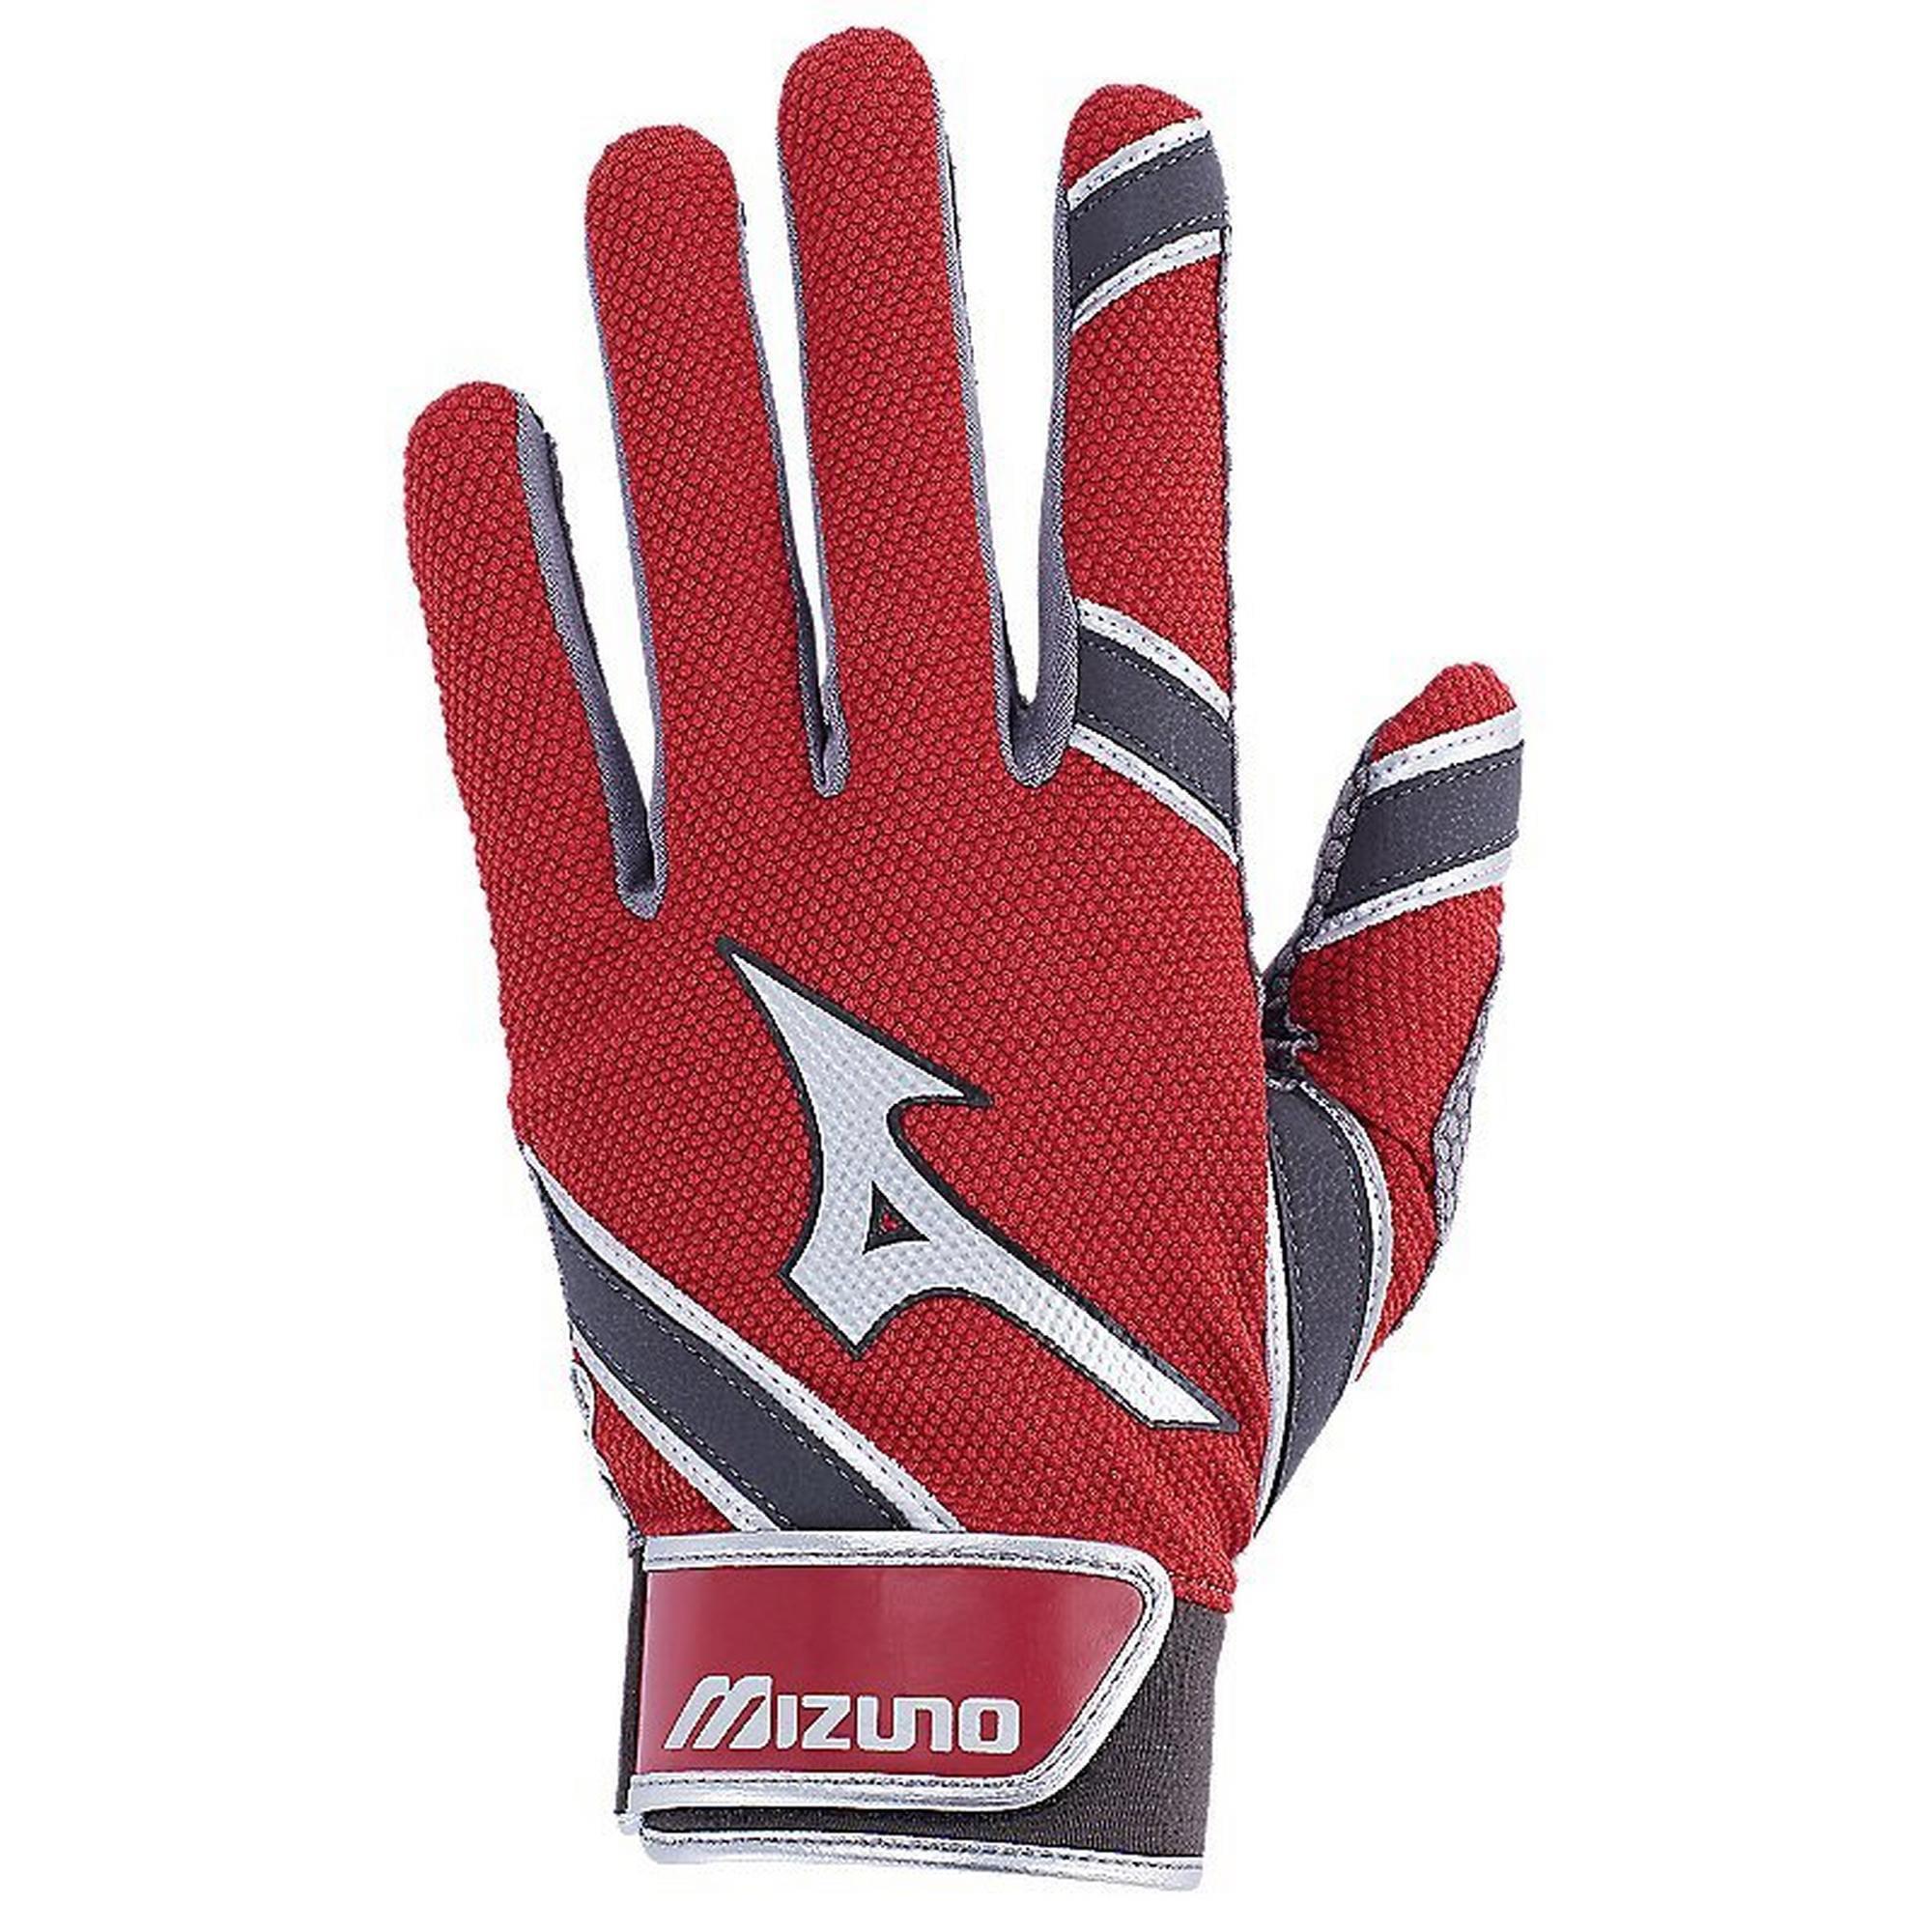 MVP Adult Baseball Batting Glove